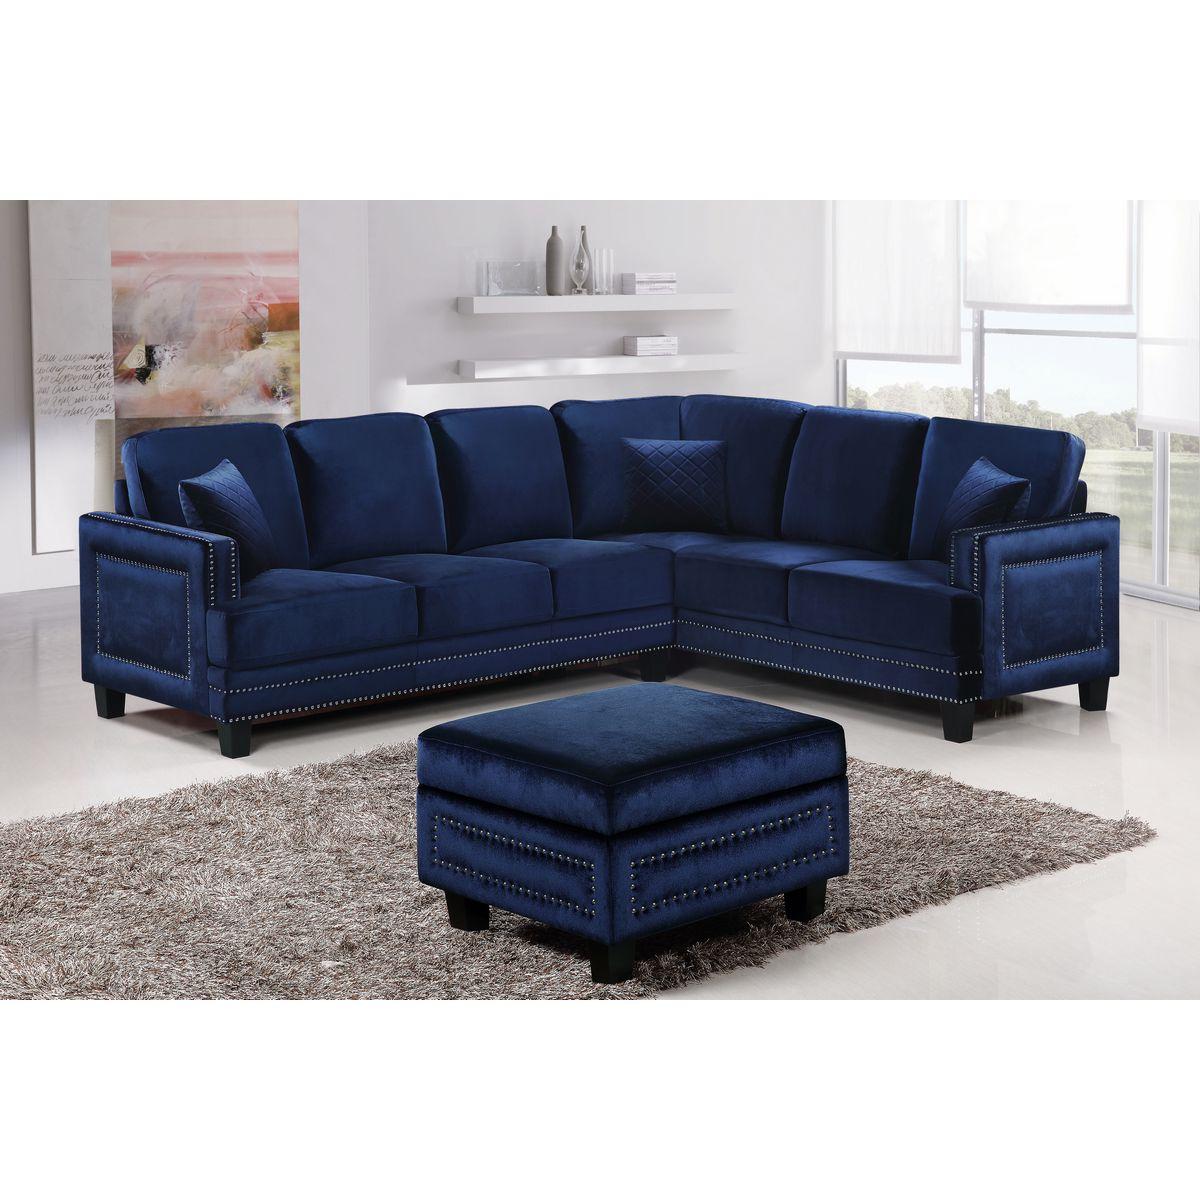 Meridian Furniture 655Navy Sectional Ferrara Sectional Sofa In Navy Velvet  W/ Nailhead Trim